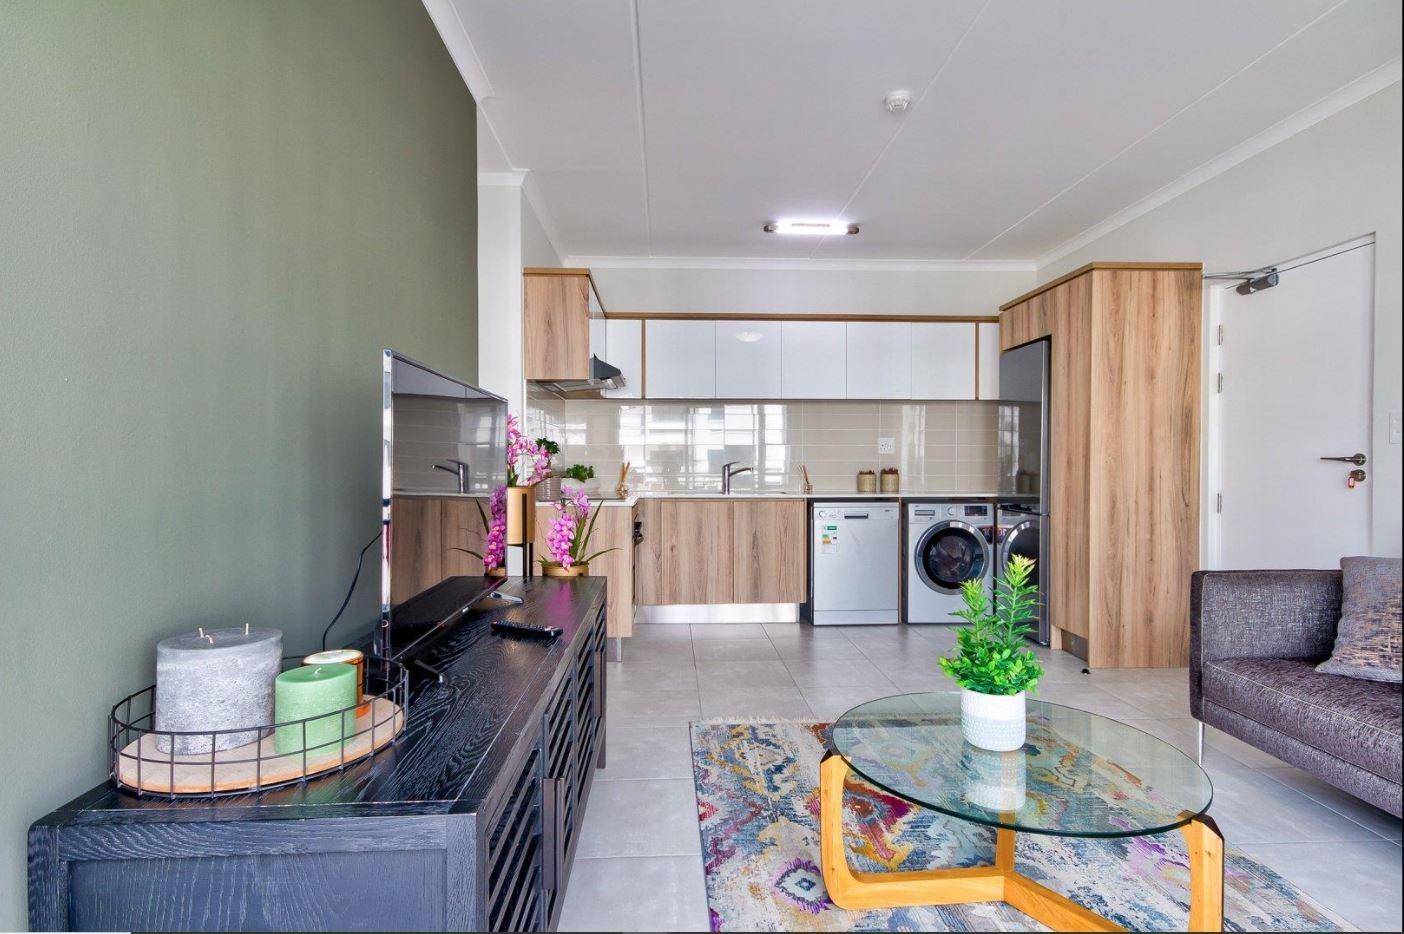 1 Bedroom Apartment / Flat For Sale in Paardevlei